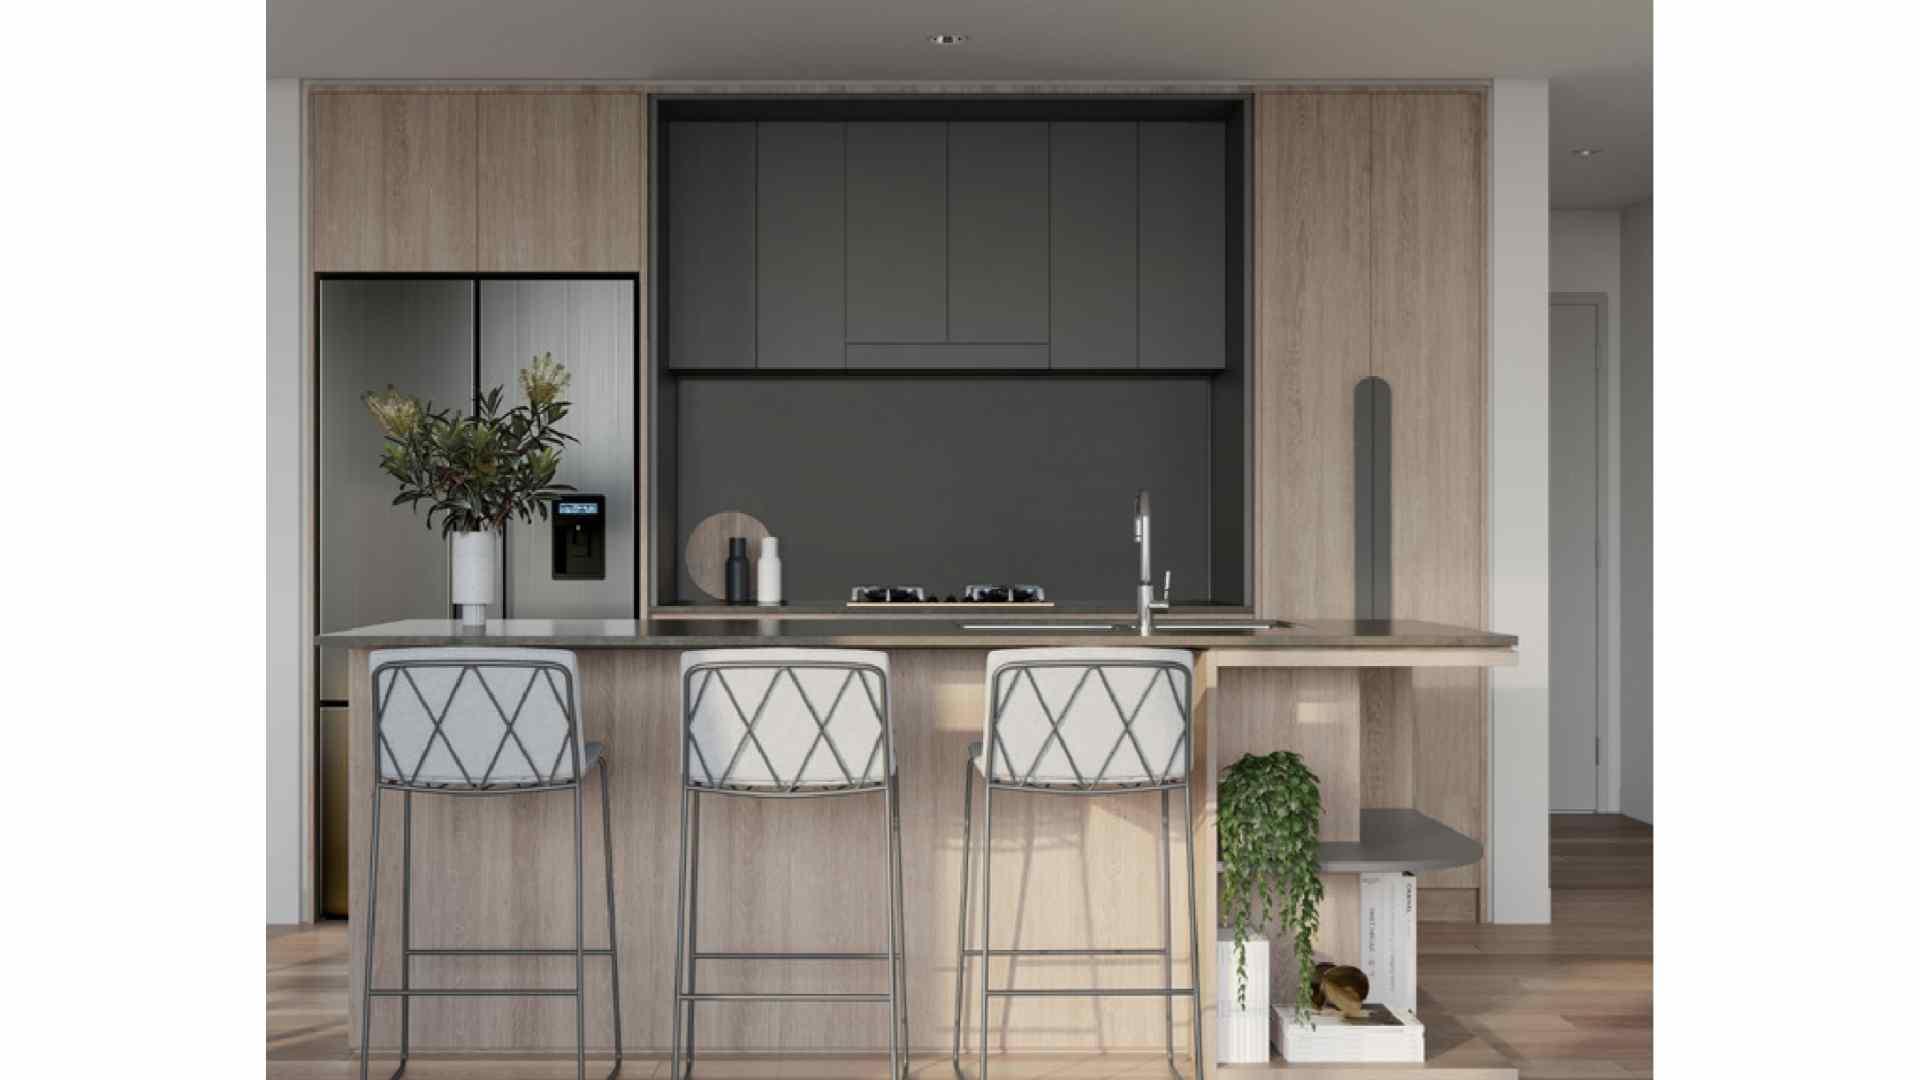 light wood and grey kitchen, 3 bar stools